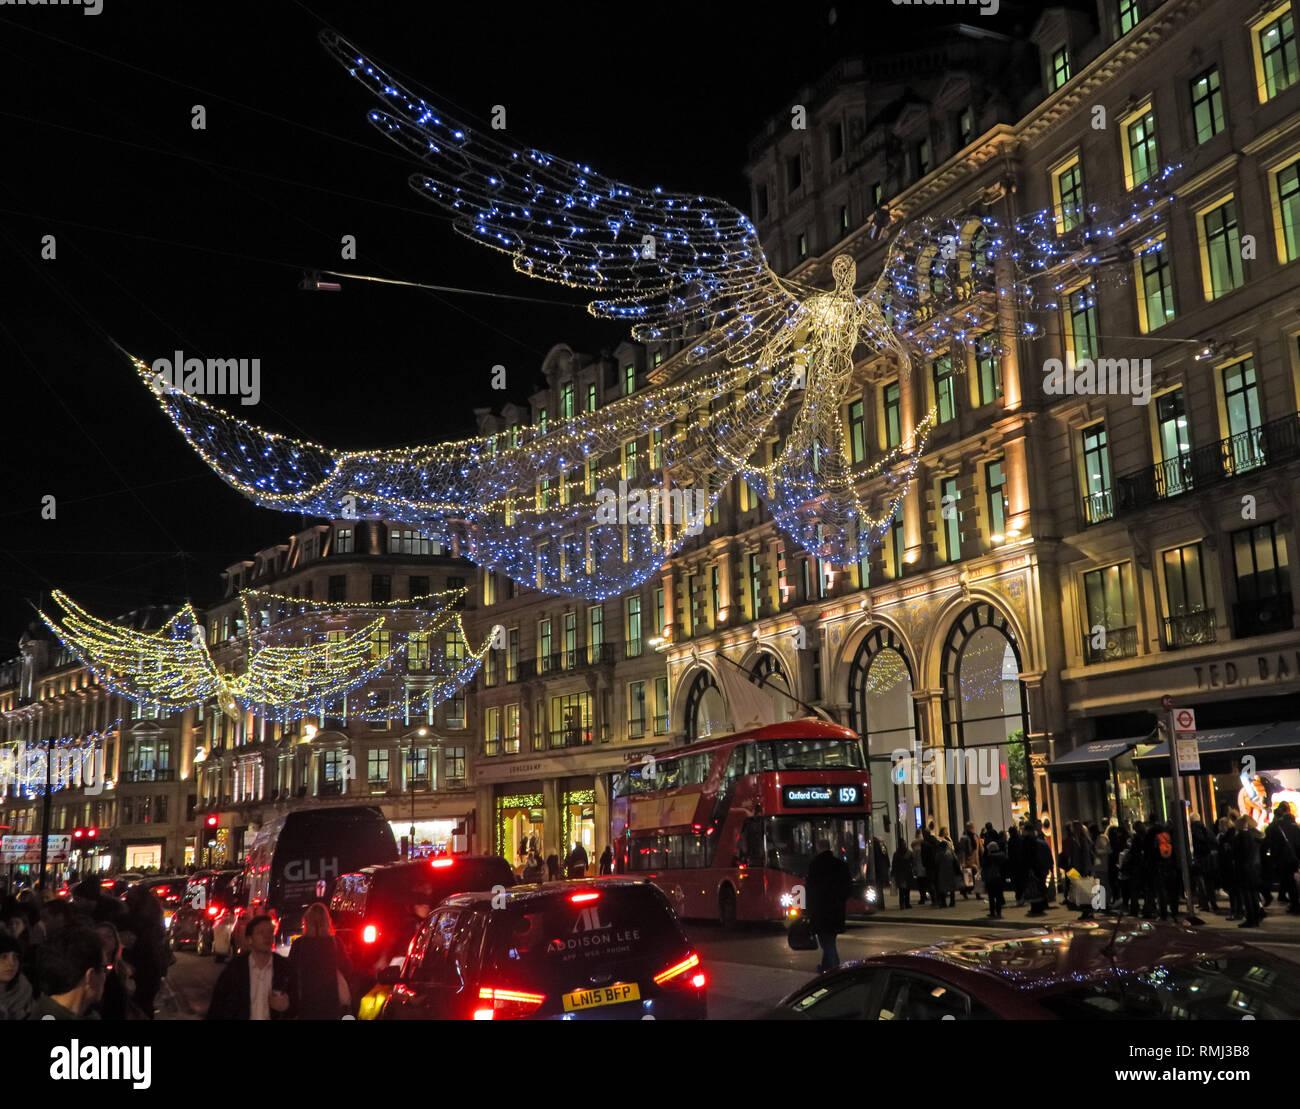 @HotpixUK,HotpixUK,GoTonySmith,England,UK,Neon,lights,night,dusk,neon lights,sign,advert,advertising,bright,lighting,London,South East England,City Centre,City,tourist,tourism,travel,London bus,Mayfair,W1B 2EN,angel,Xmas lights,Xmas,christmas,shops,retail,shopping,flagship retail stores,flagship,Liberty,Hamleys,Jaeger,Piccadilly Circus